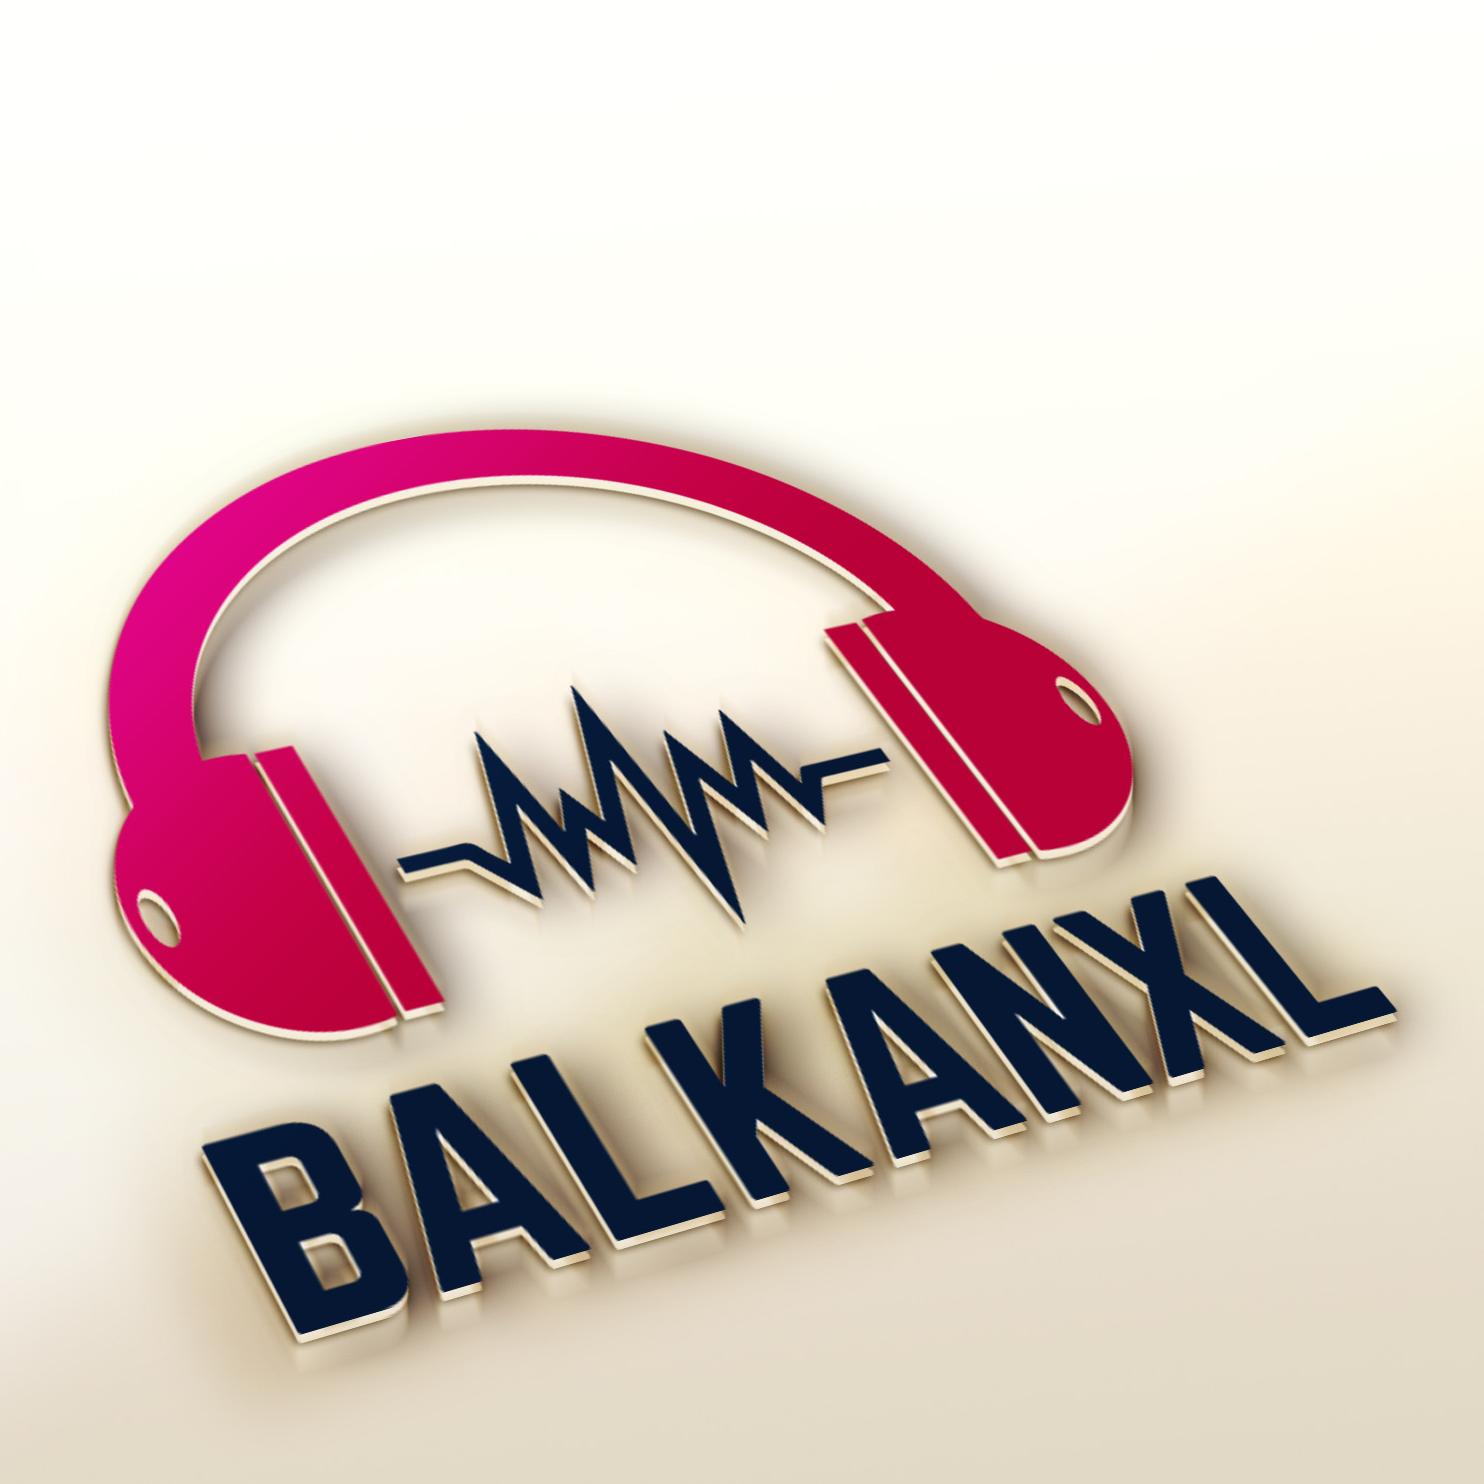 Balkan X L Online Radio